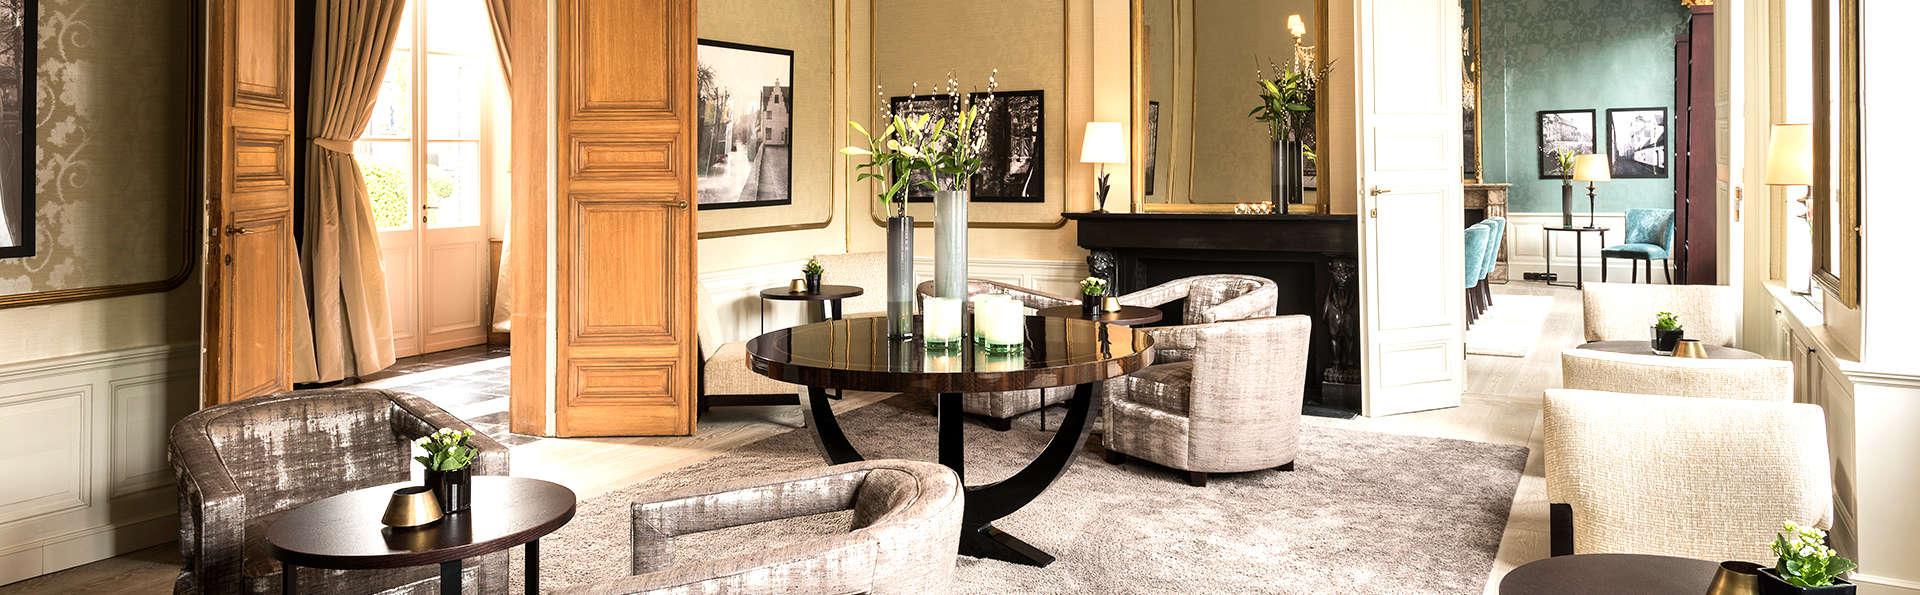 Hotel Dukes' Palace - EDIT_NEW_LOUNGE2.jpg